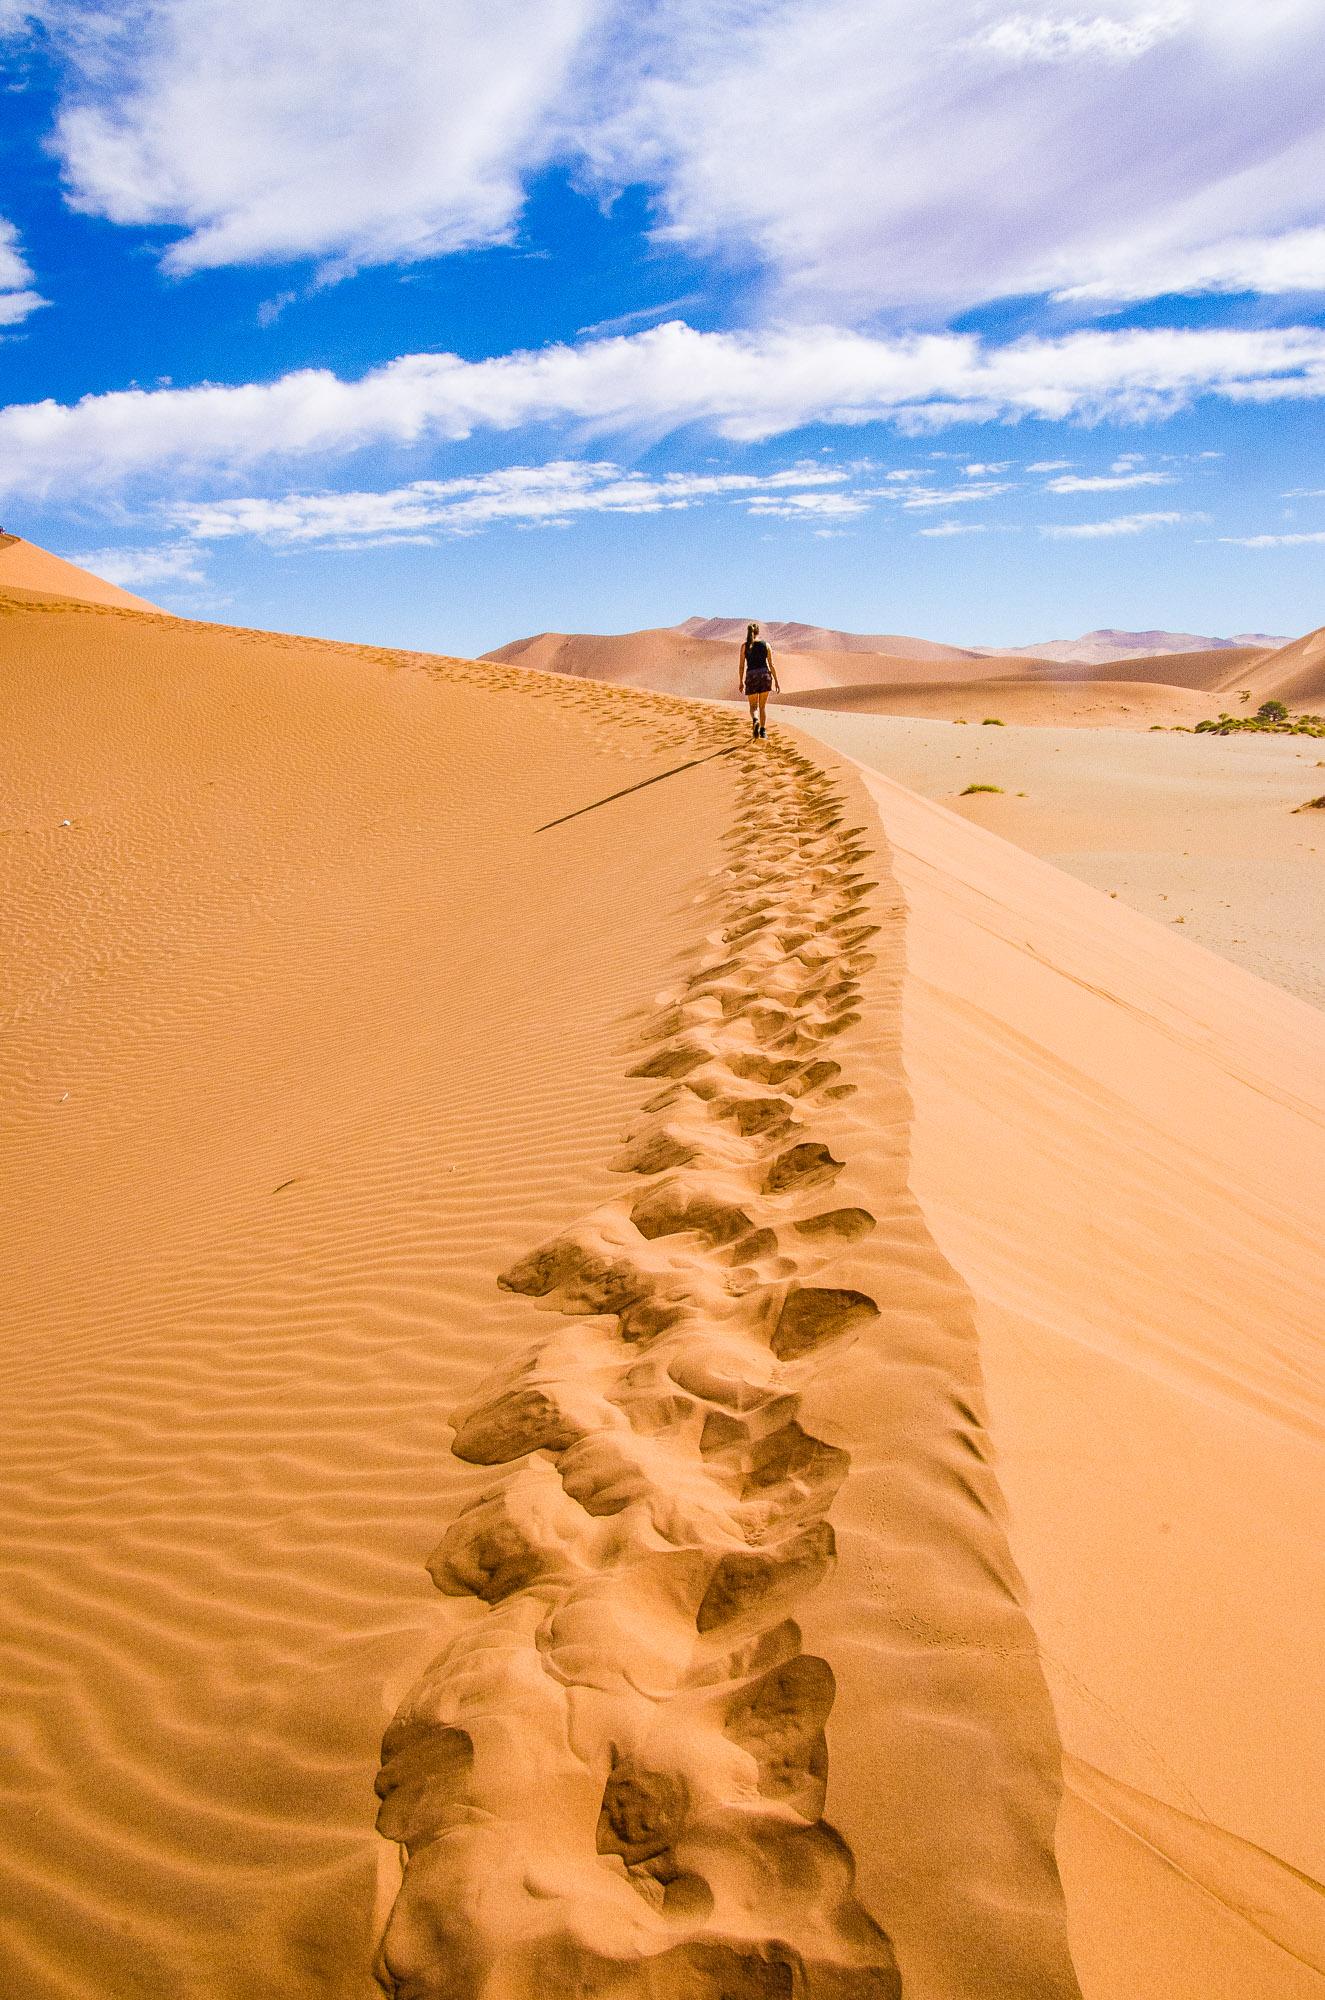 dune randonne escalader 1 - sossuvlei - le desert du namibie - afrique, namibie